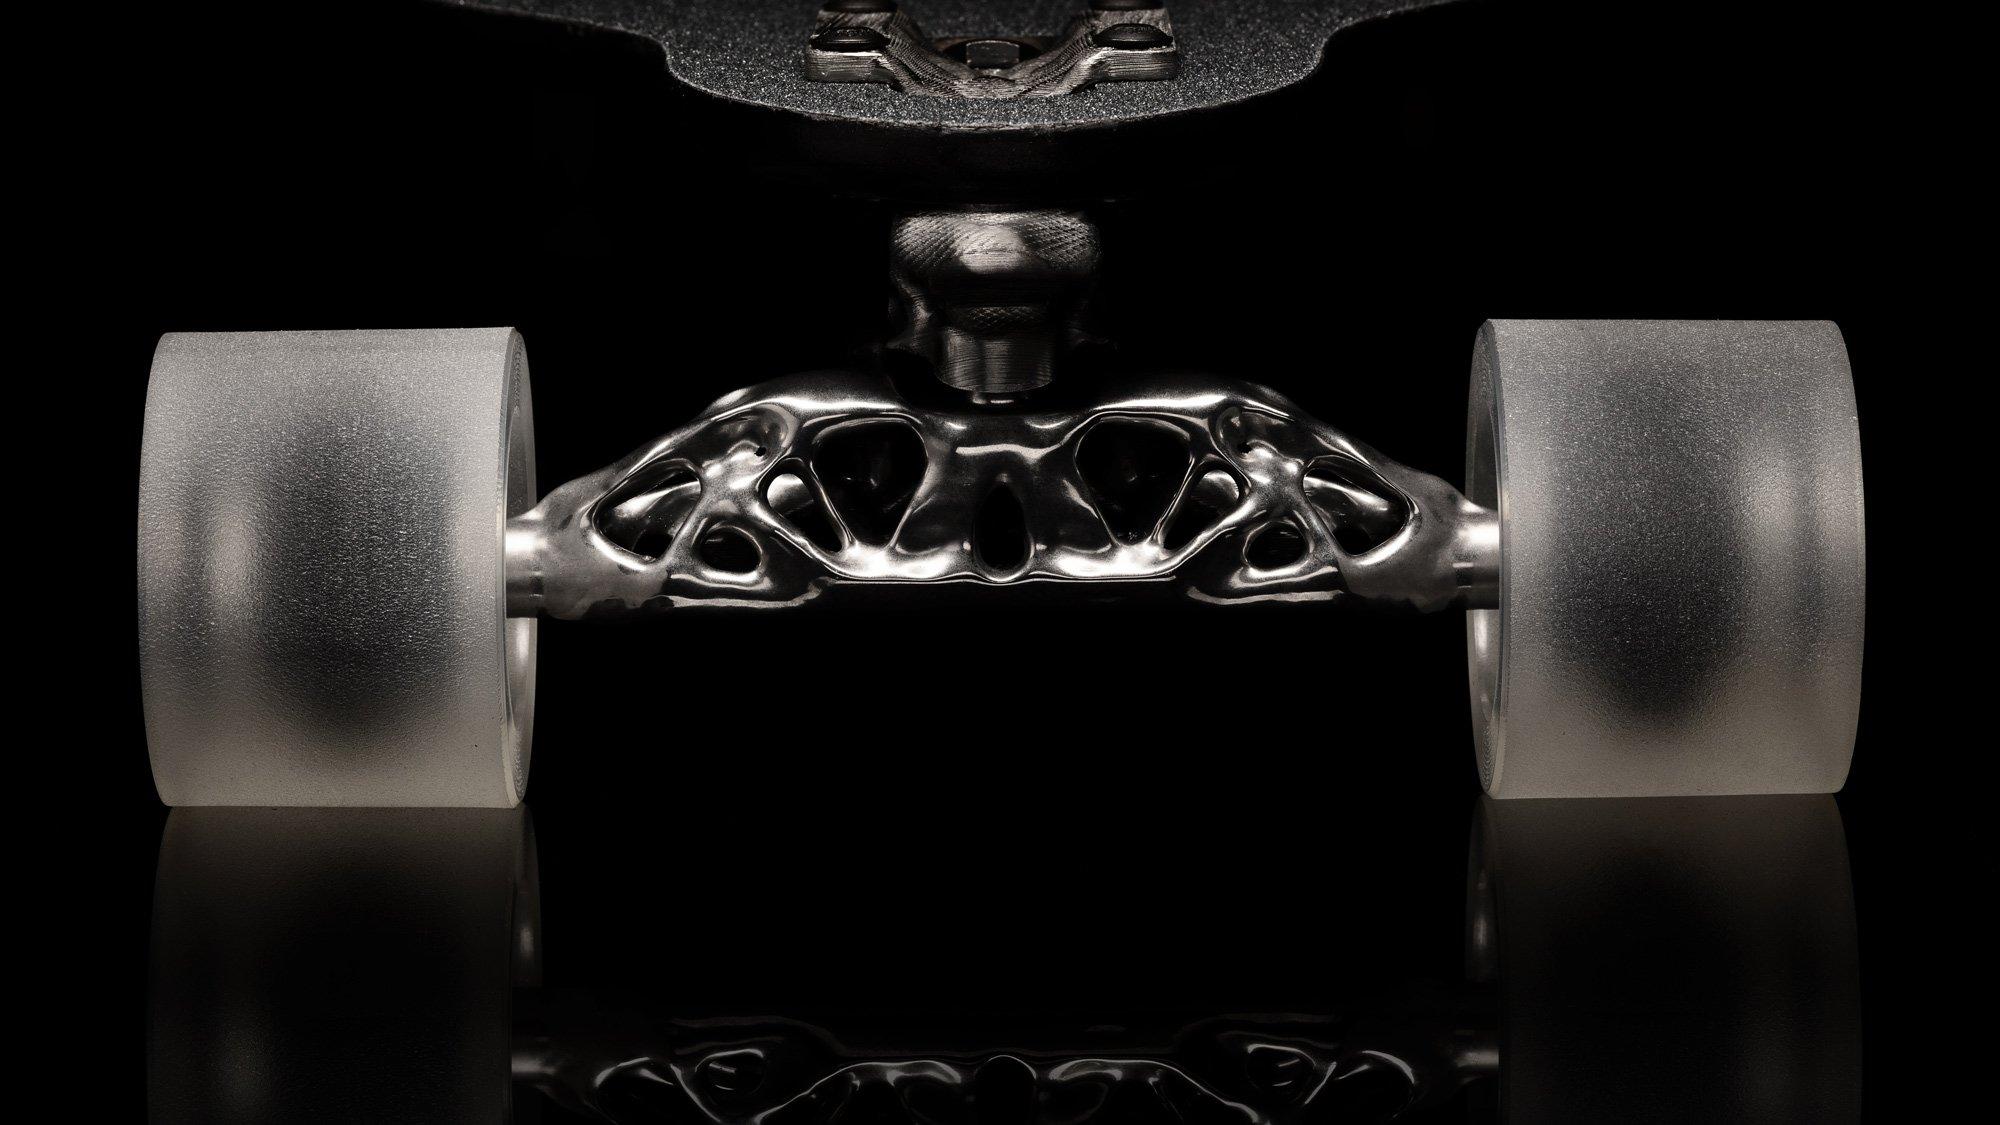 Impresora 3D metal: guía de compra de 2020 | All3DP Pro